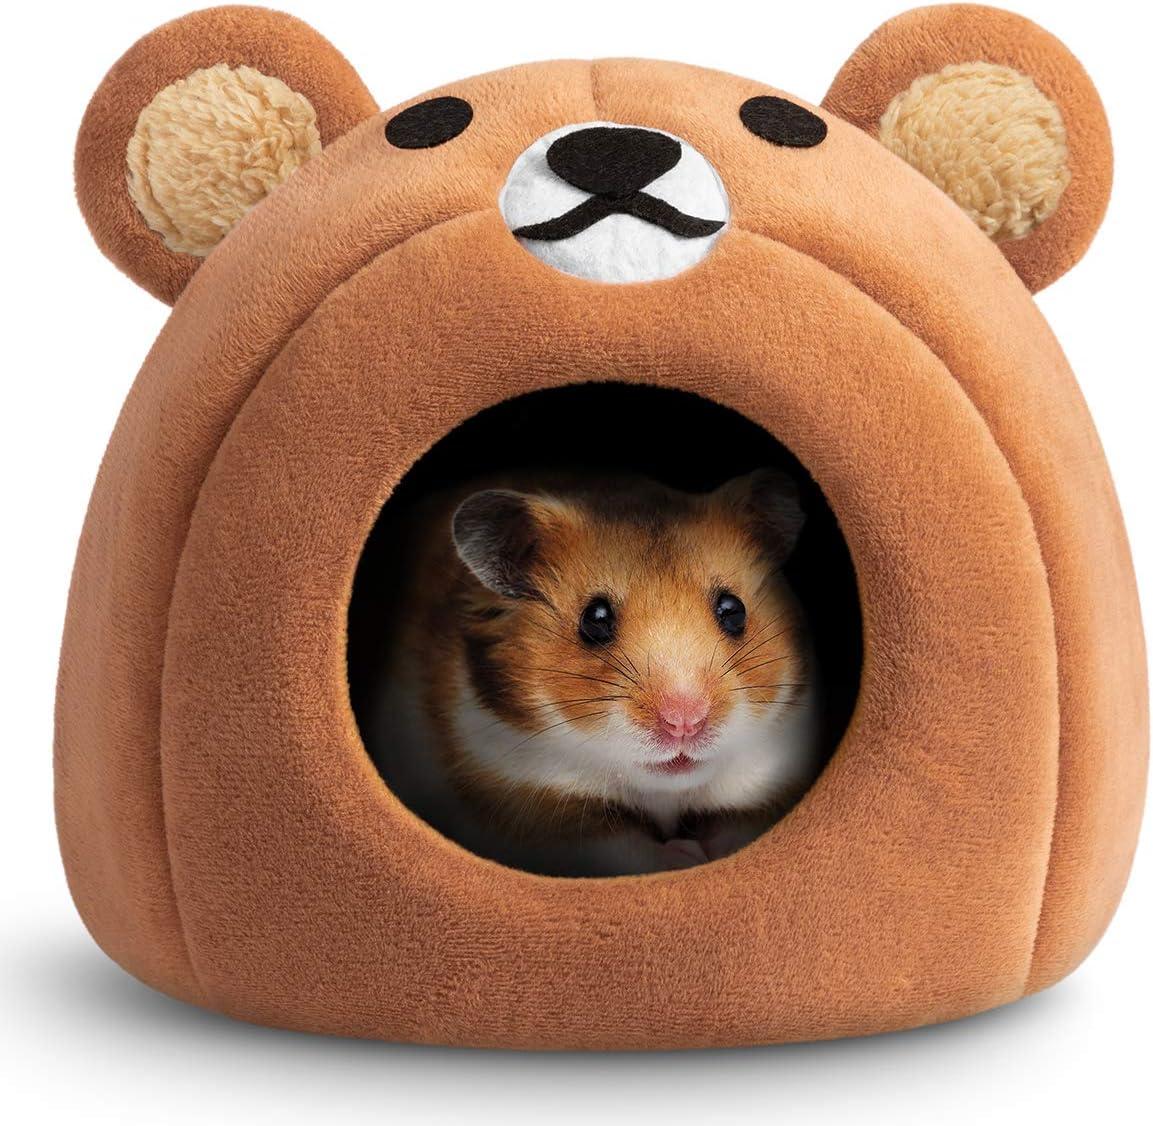 Rat Small pet Elephants Snuggle  Cuddle Cube Hedgehog Hamster Guinea Pig